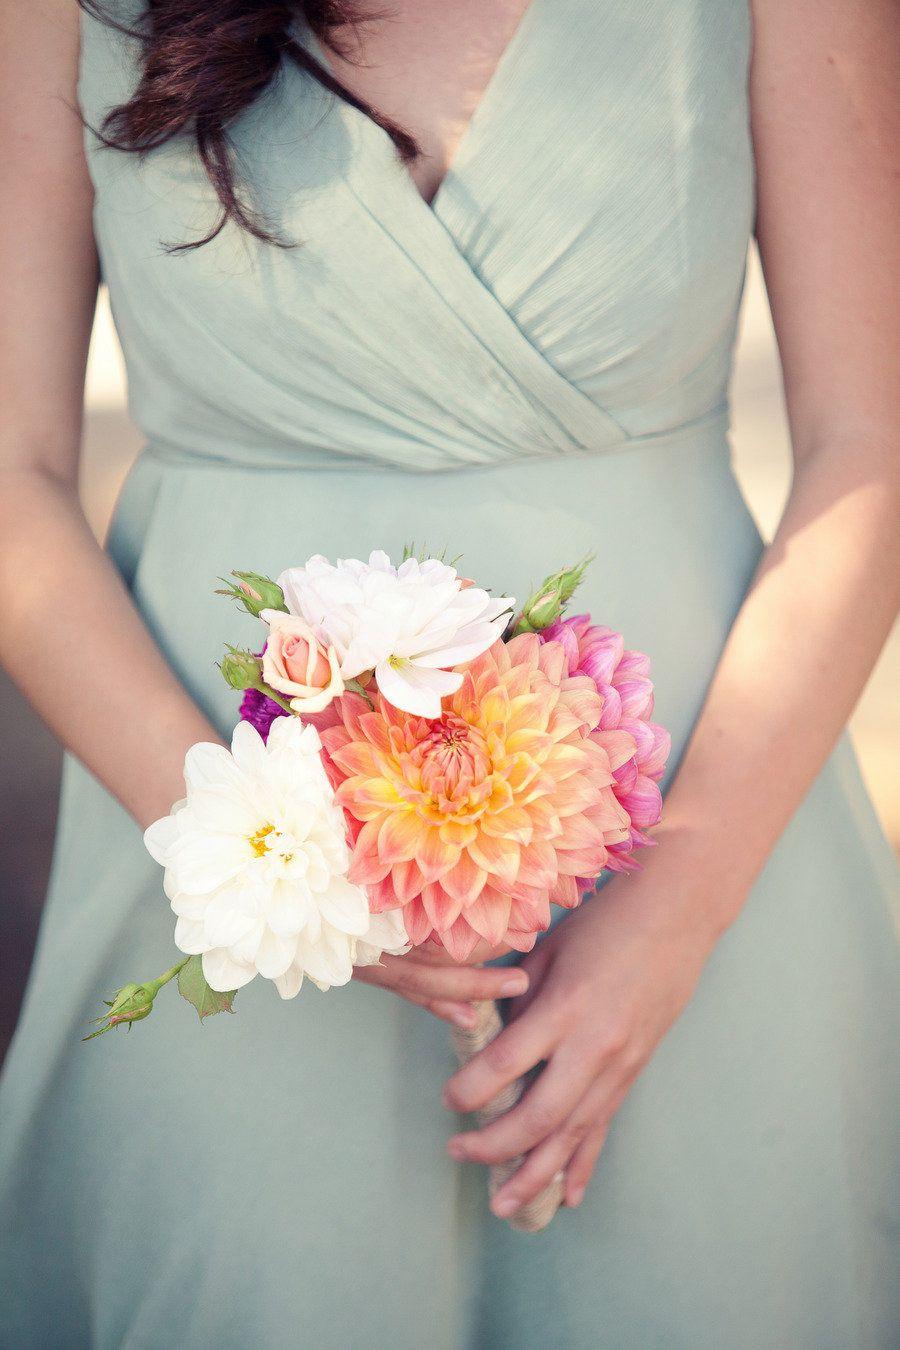 #bouquet  Photography: Danielle Gillett Photography - gillettphoto.com Coordination: Wedding Architects - wedding-architects.com  Read More: http://www.stylemepretty.com/2012/11/07/backyard-santa-cruz-wedding-from-danielle-gillett-photography/